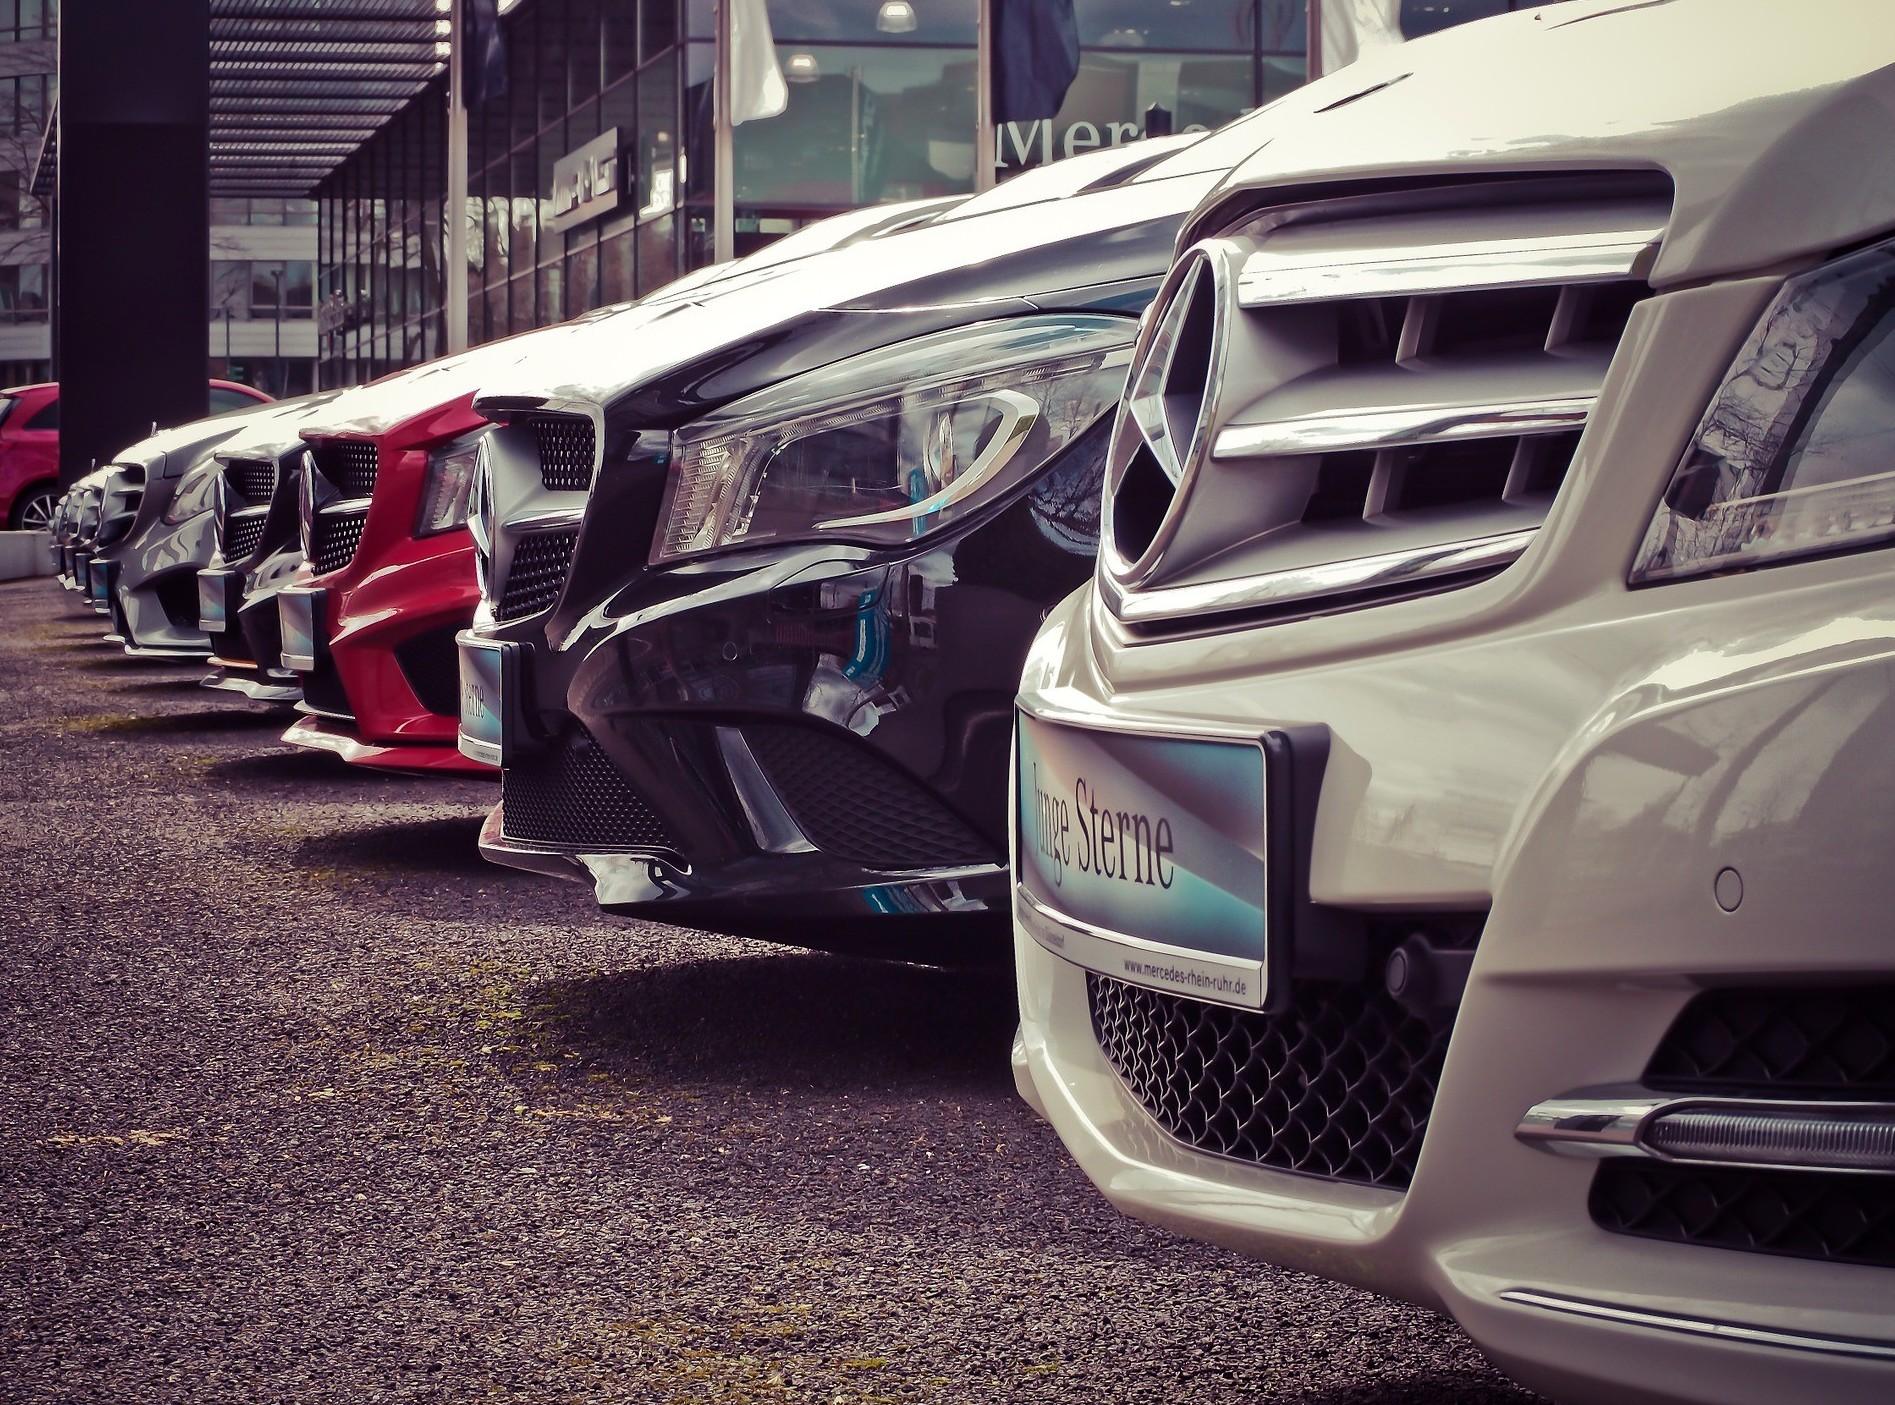 Auto Euro 6 diesel, benzina, ibride. Lis